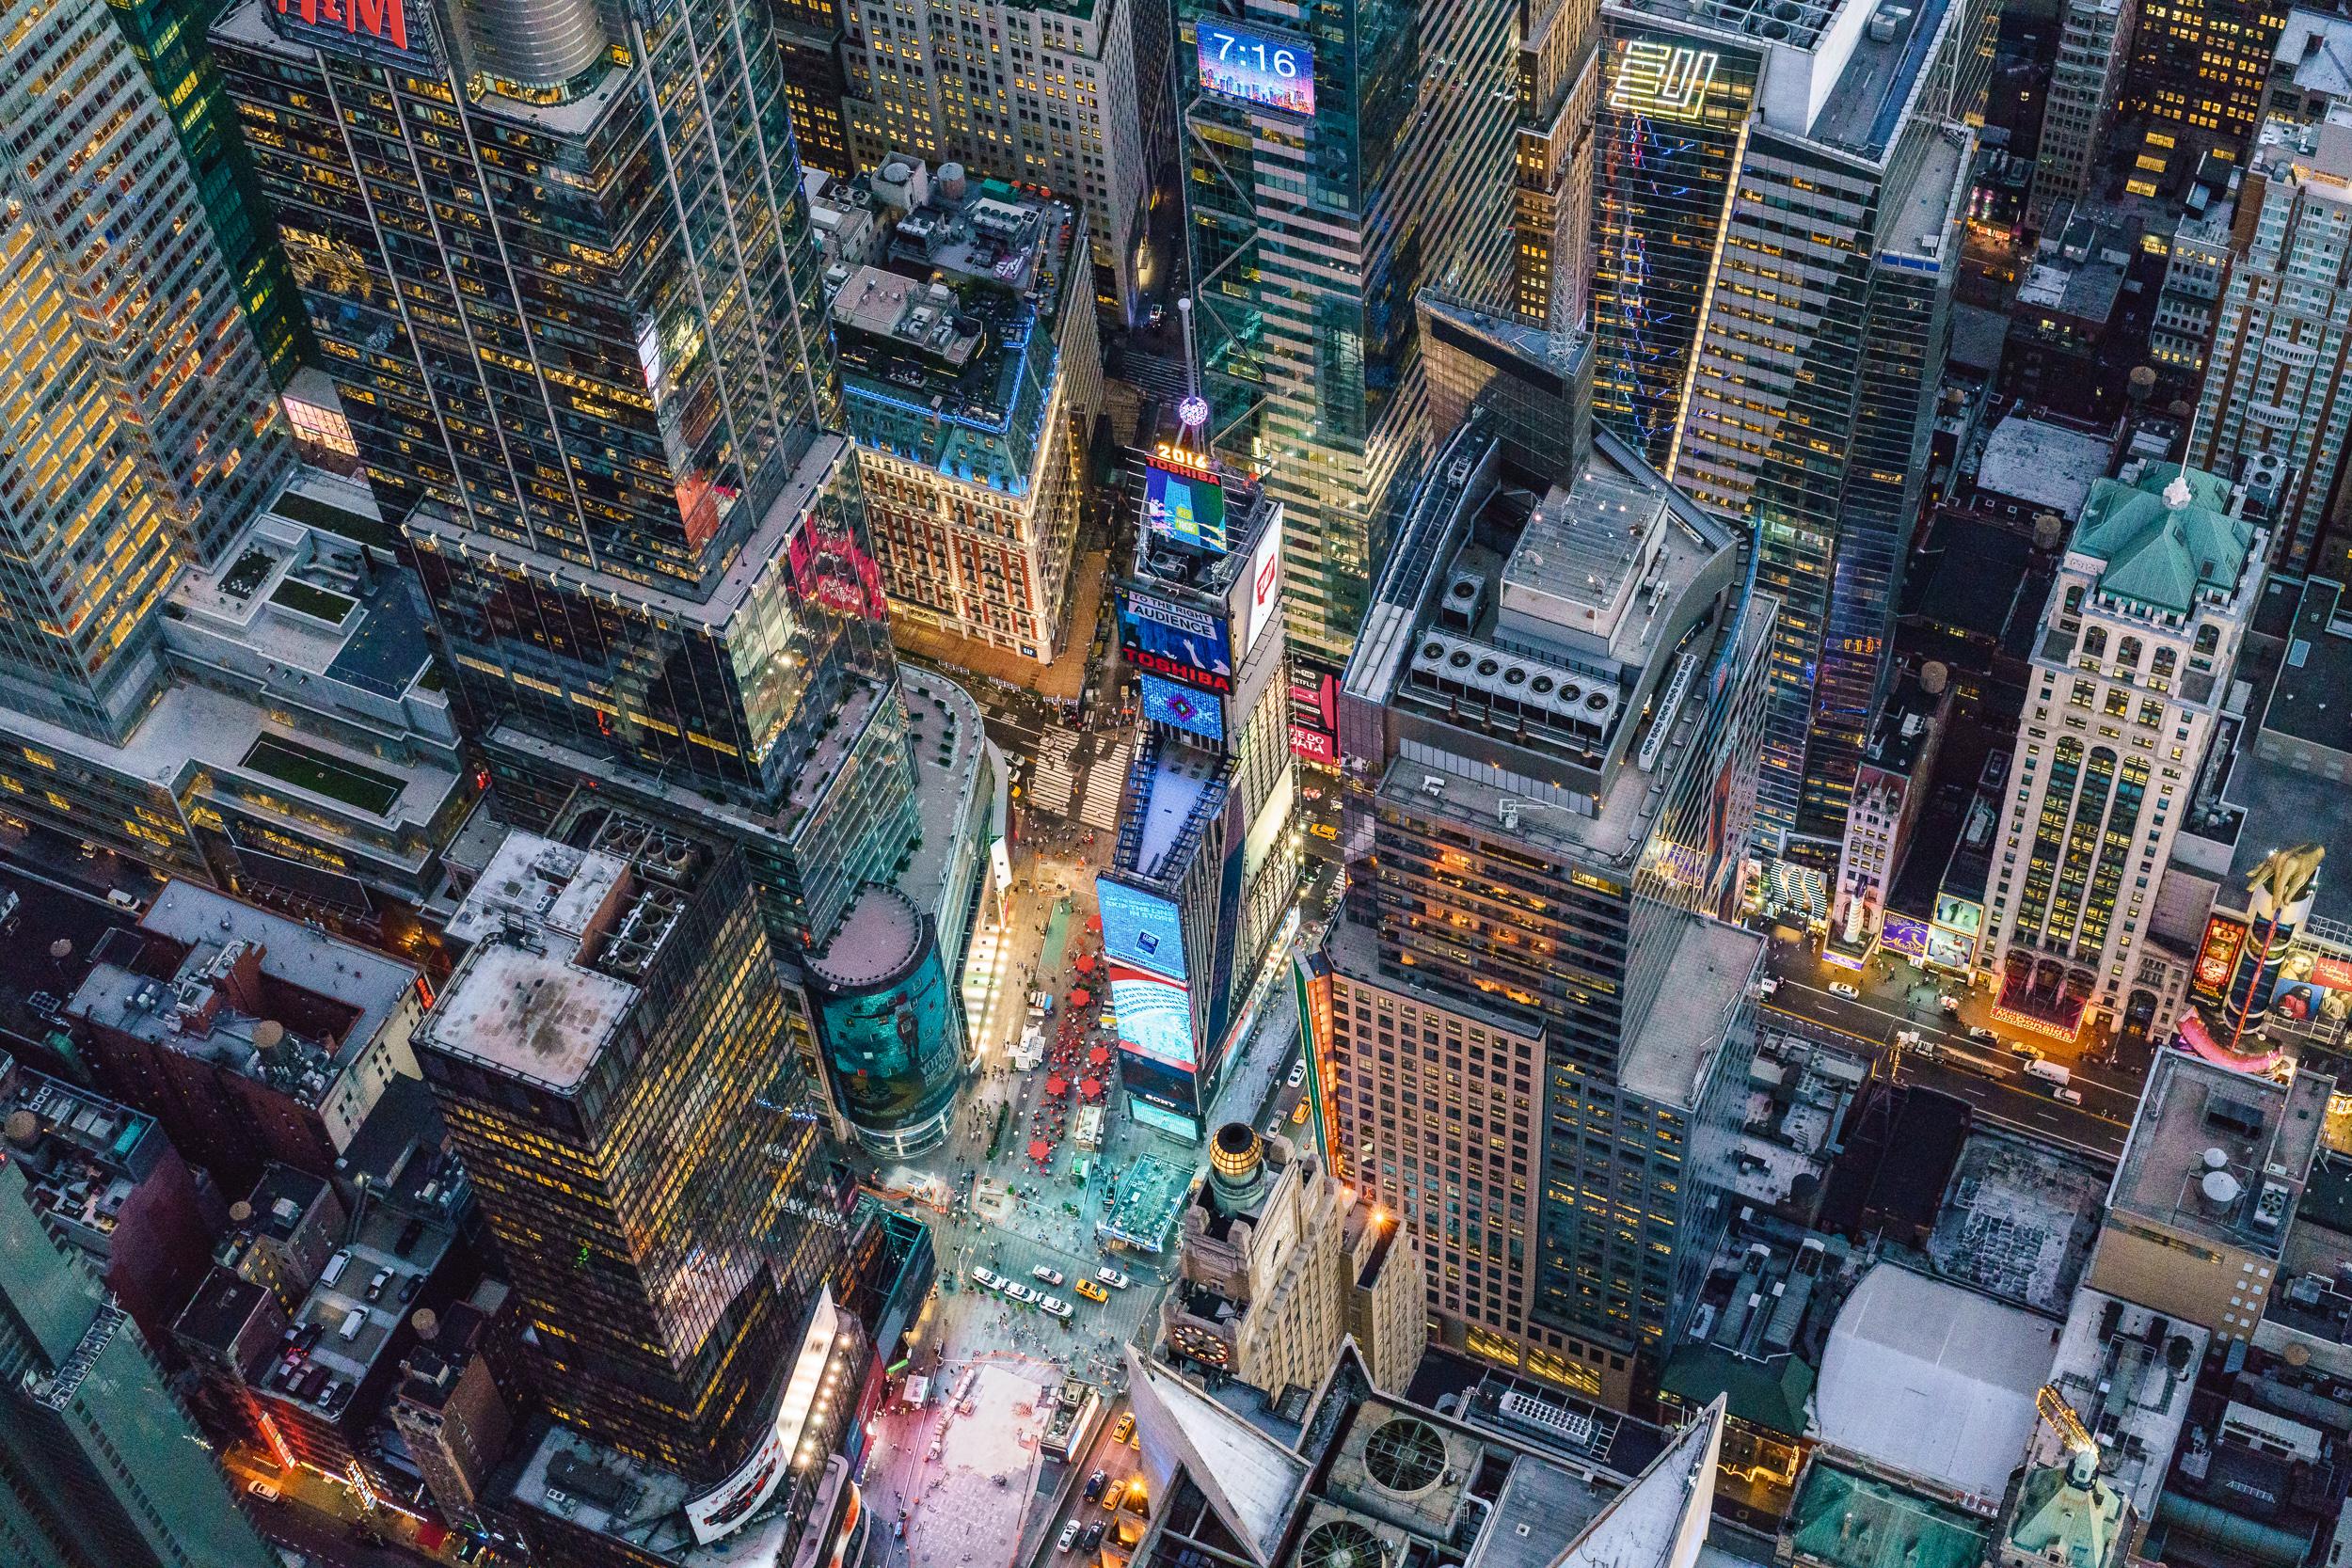 7:16 PM Times Square